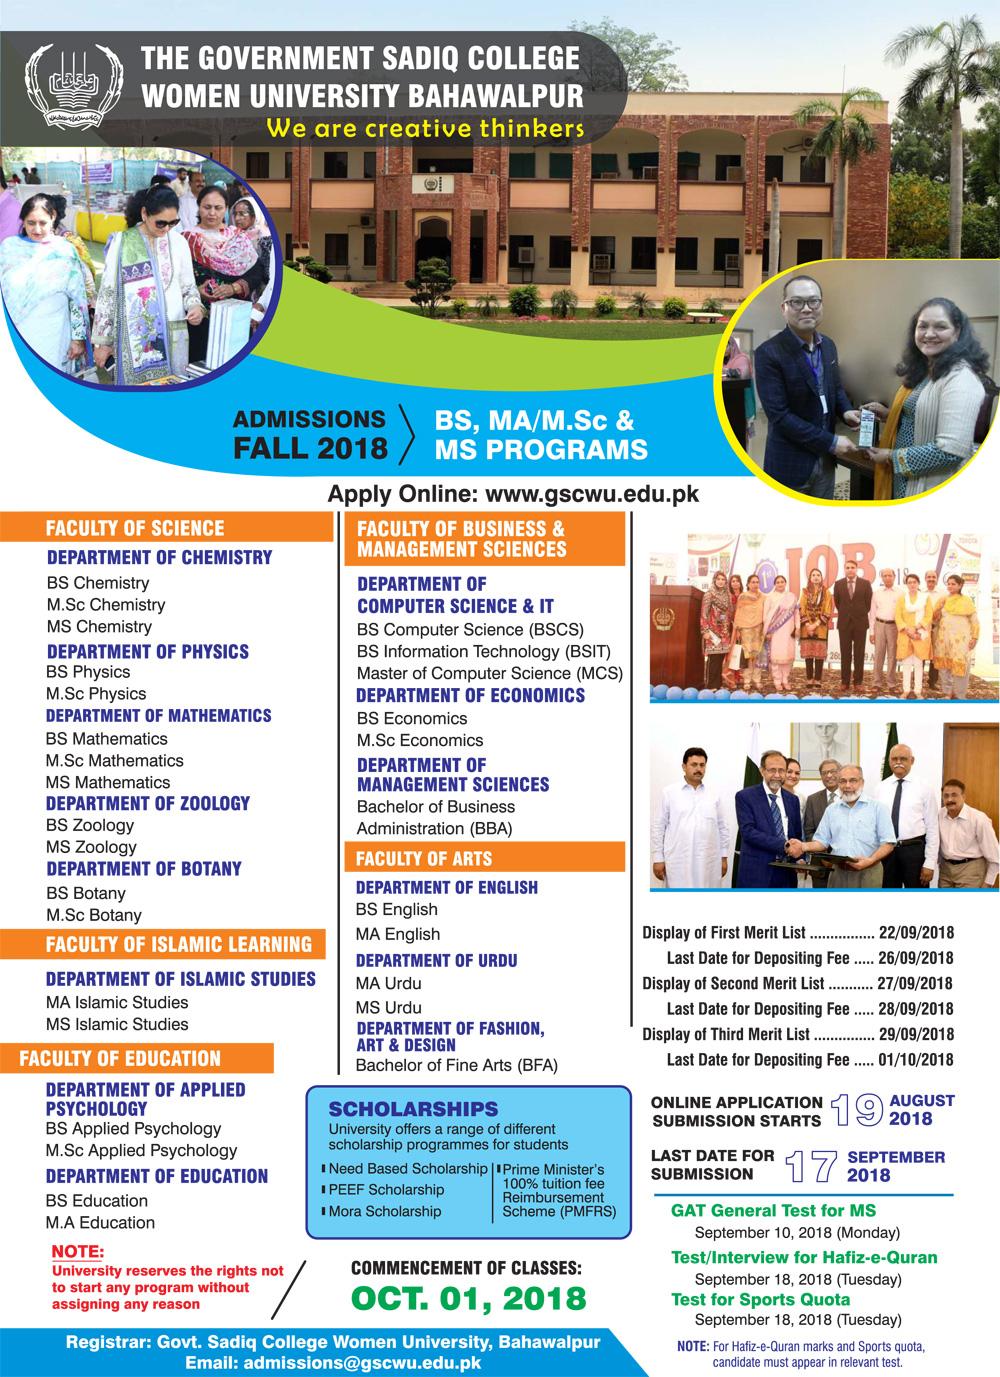 Govt Sadiq College Women University Bahawalpur GSCWU Admission 2018 Form Online Apply